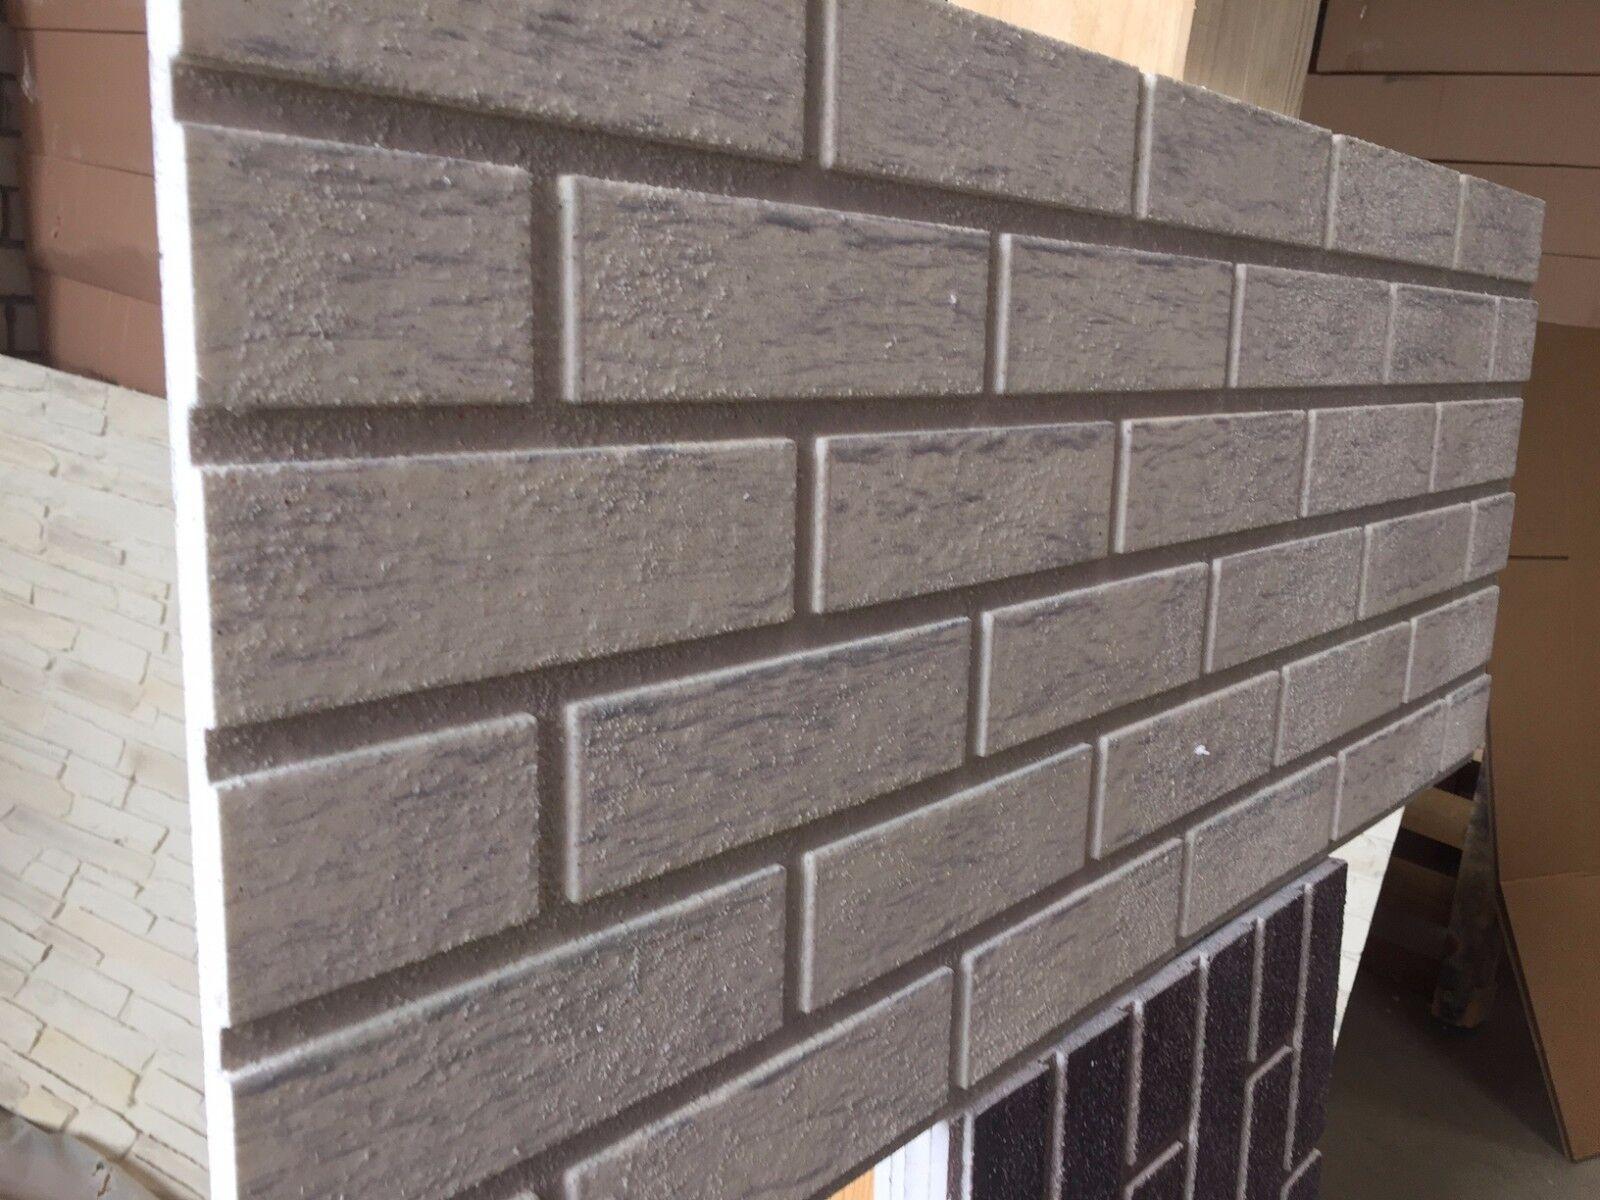 Wandverkleidung Steinoptik Wandpaneele Steinpaneele Granitoptik Wandpaneele Fassade Bodenbeläge & Fliesen